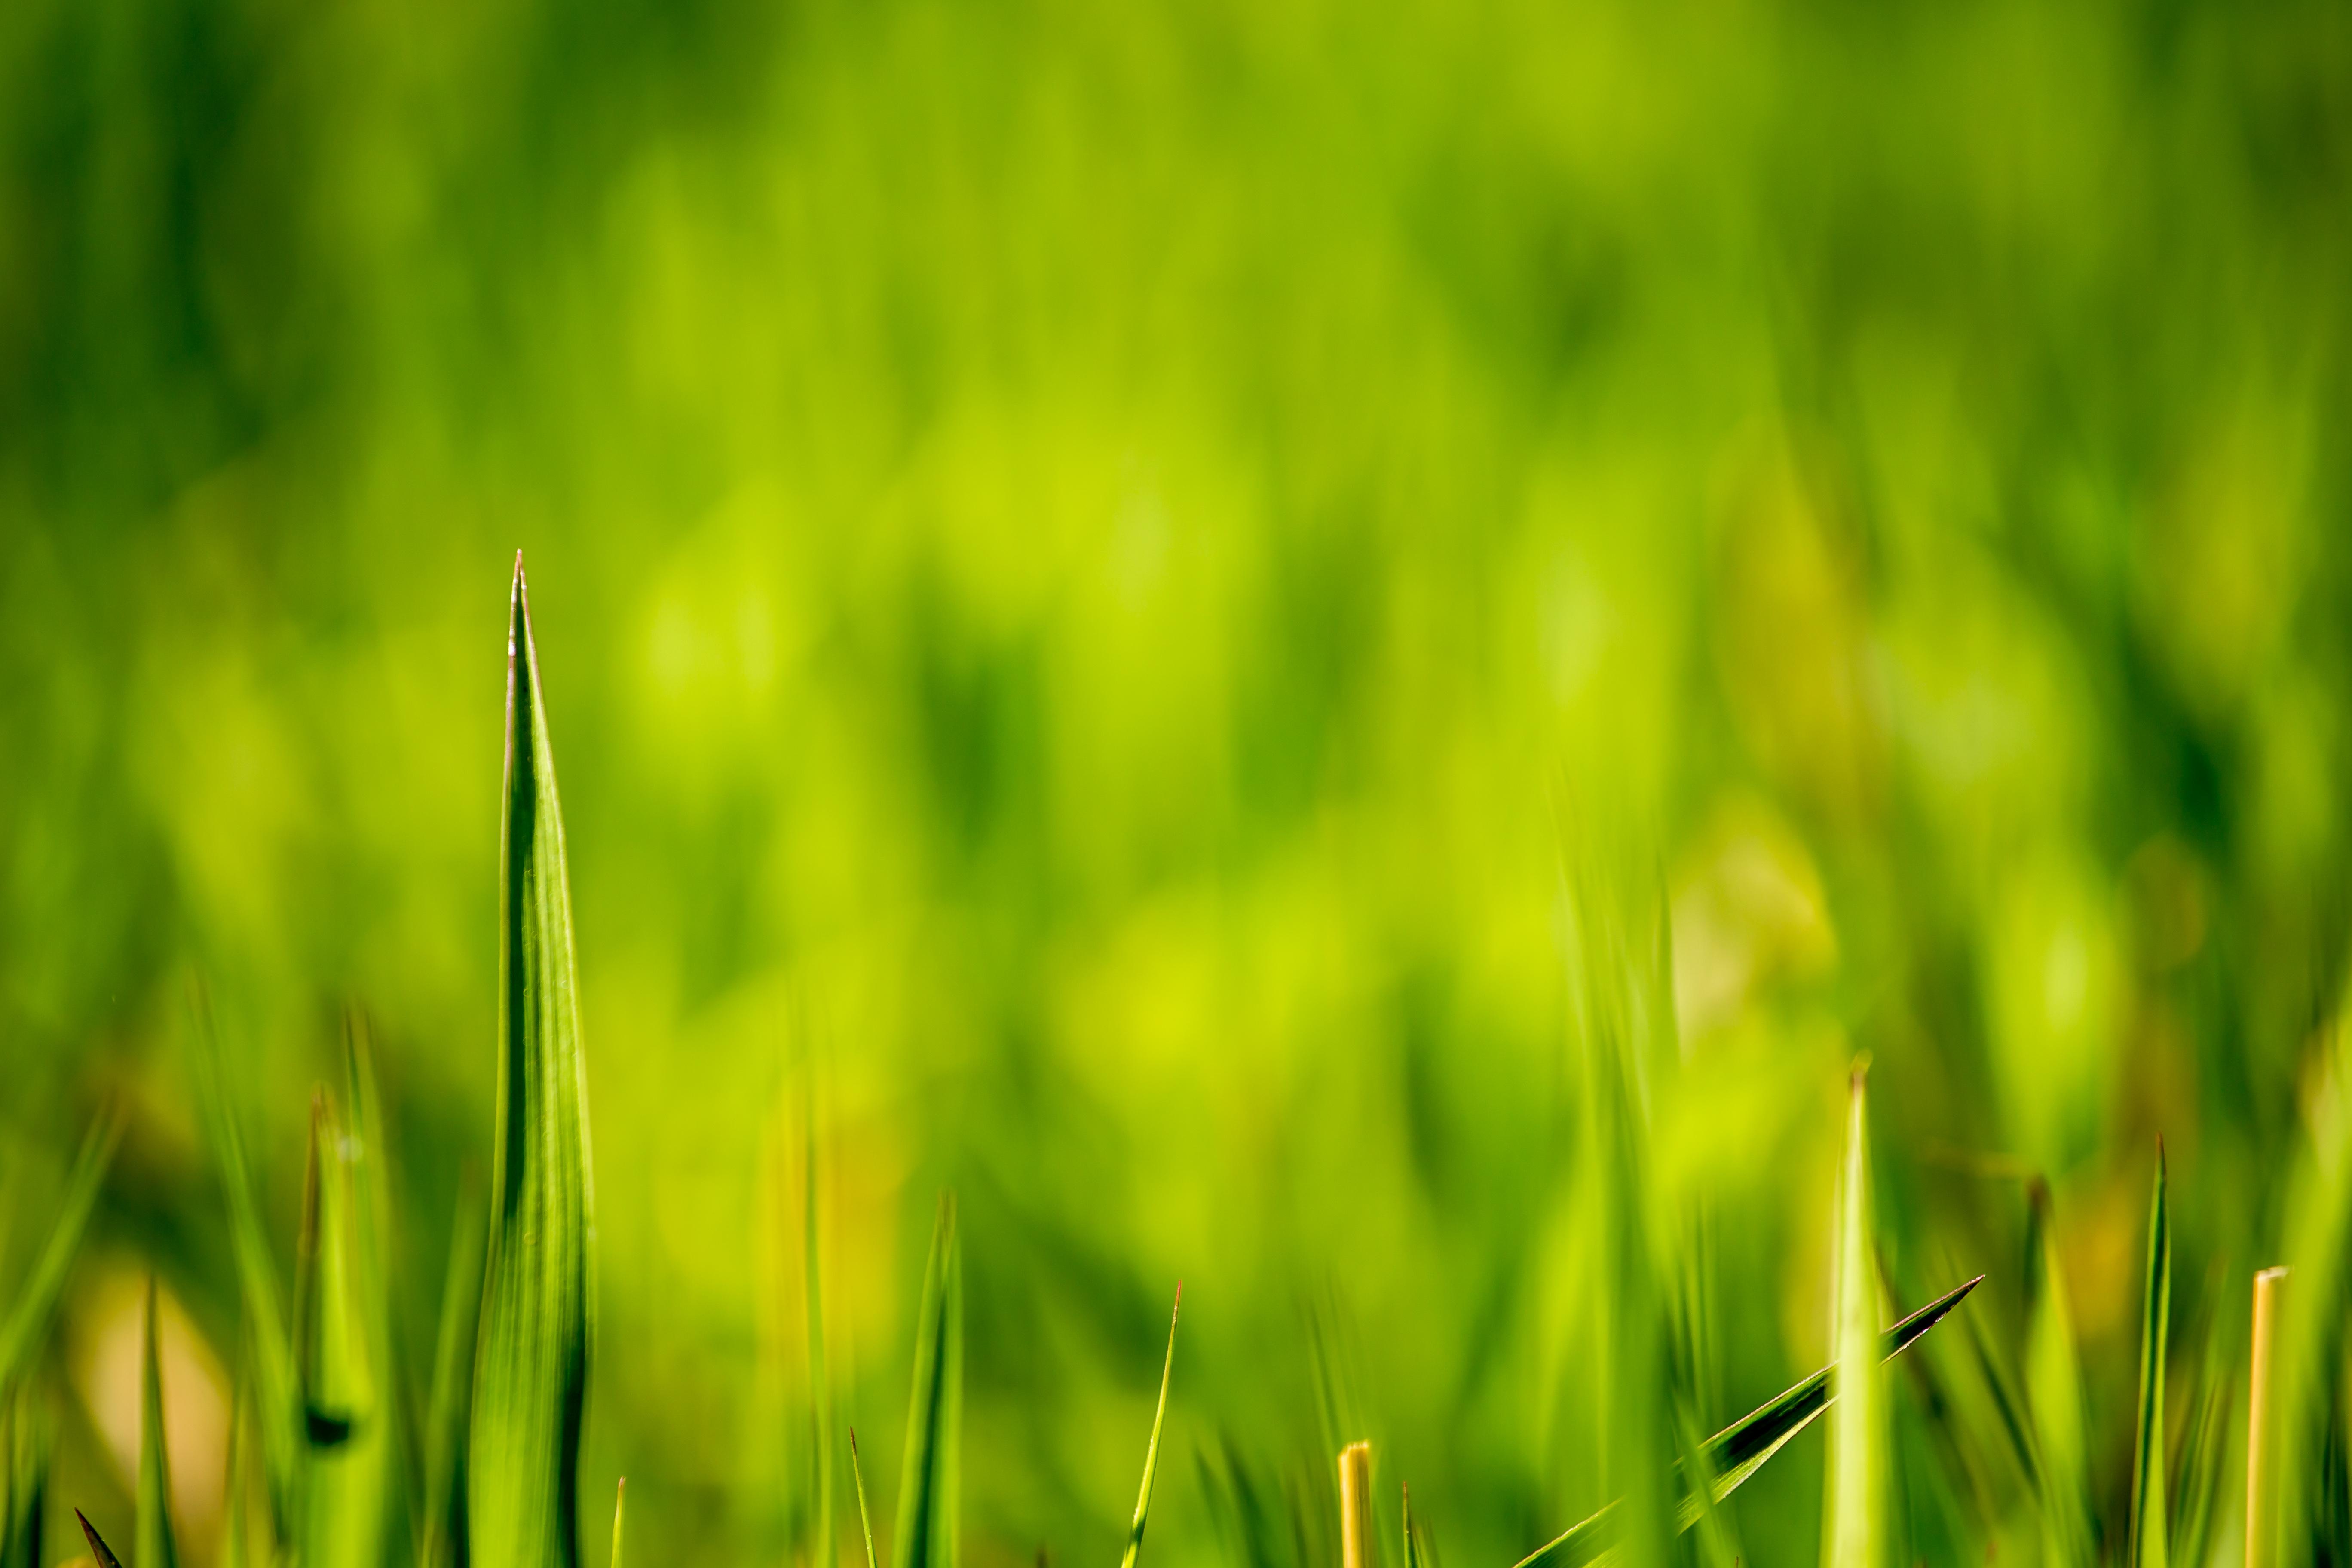 12 Beautiful Green Grass Field Hd Wallpapers Osxdaily